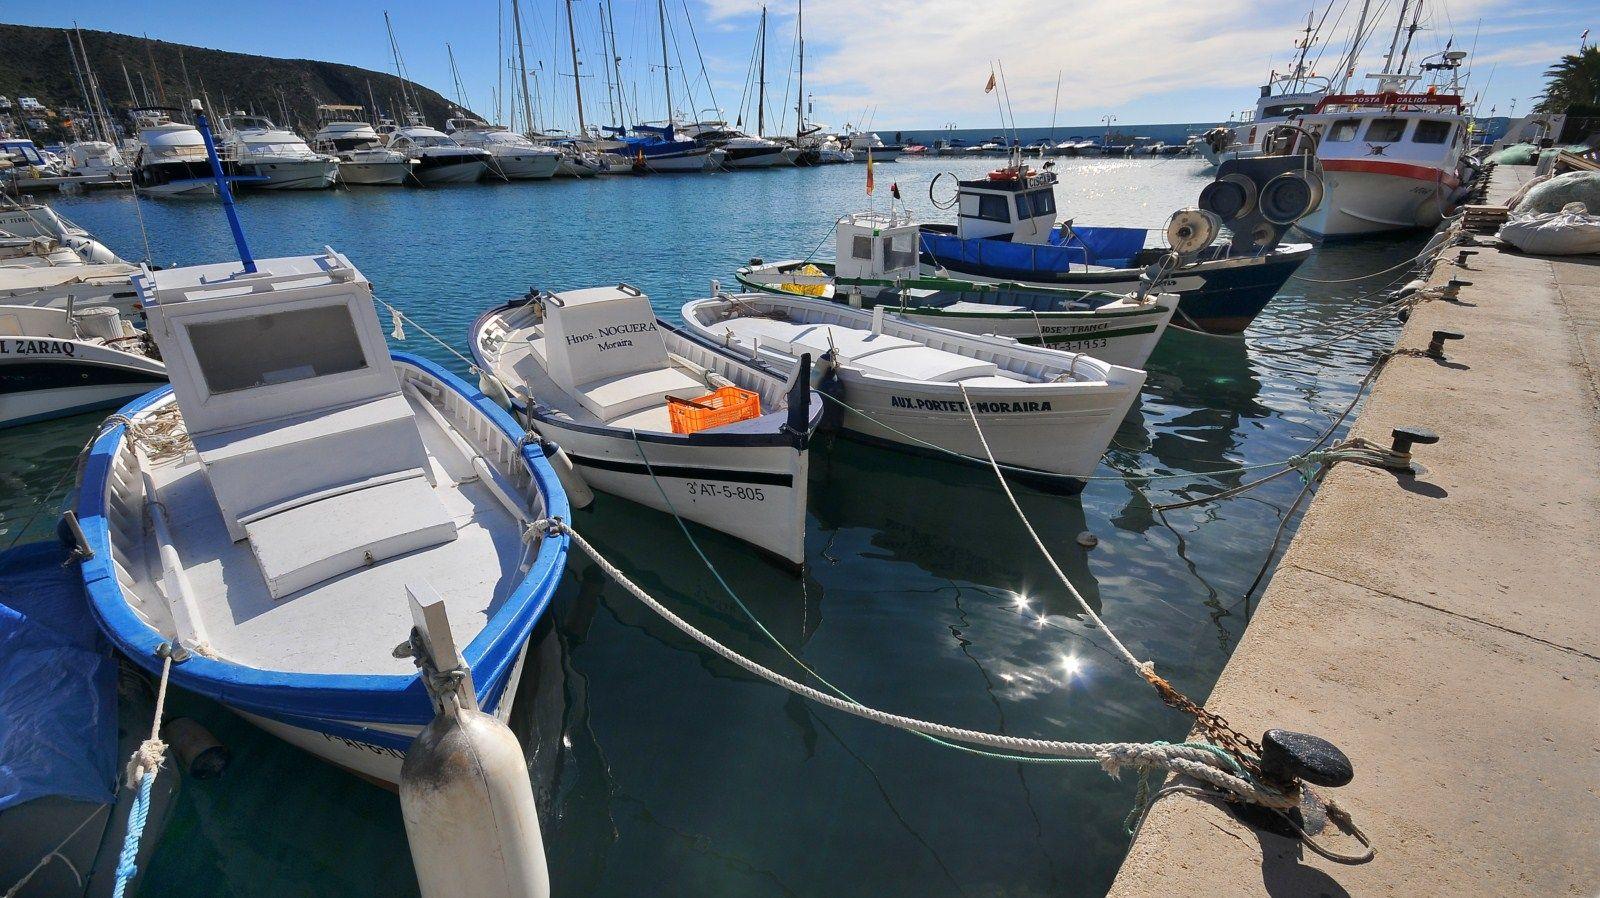 Plezier vissersbootjes in de haven.